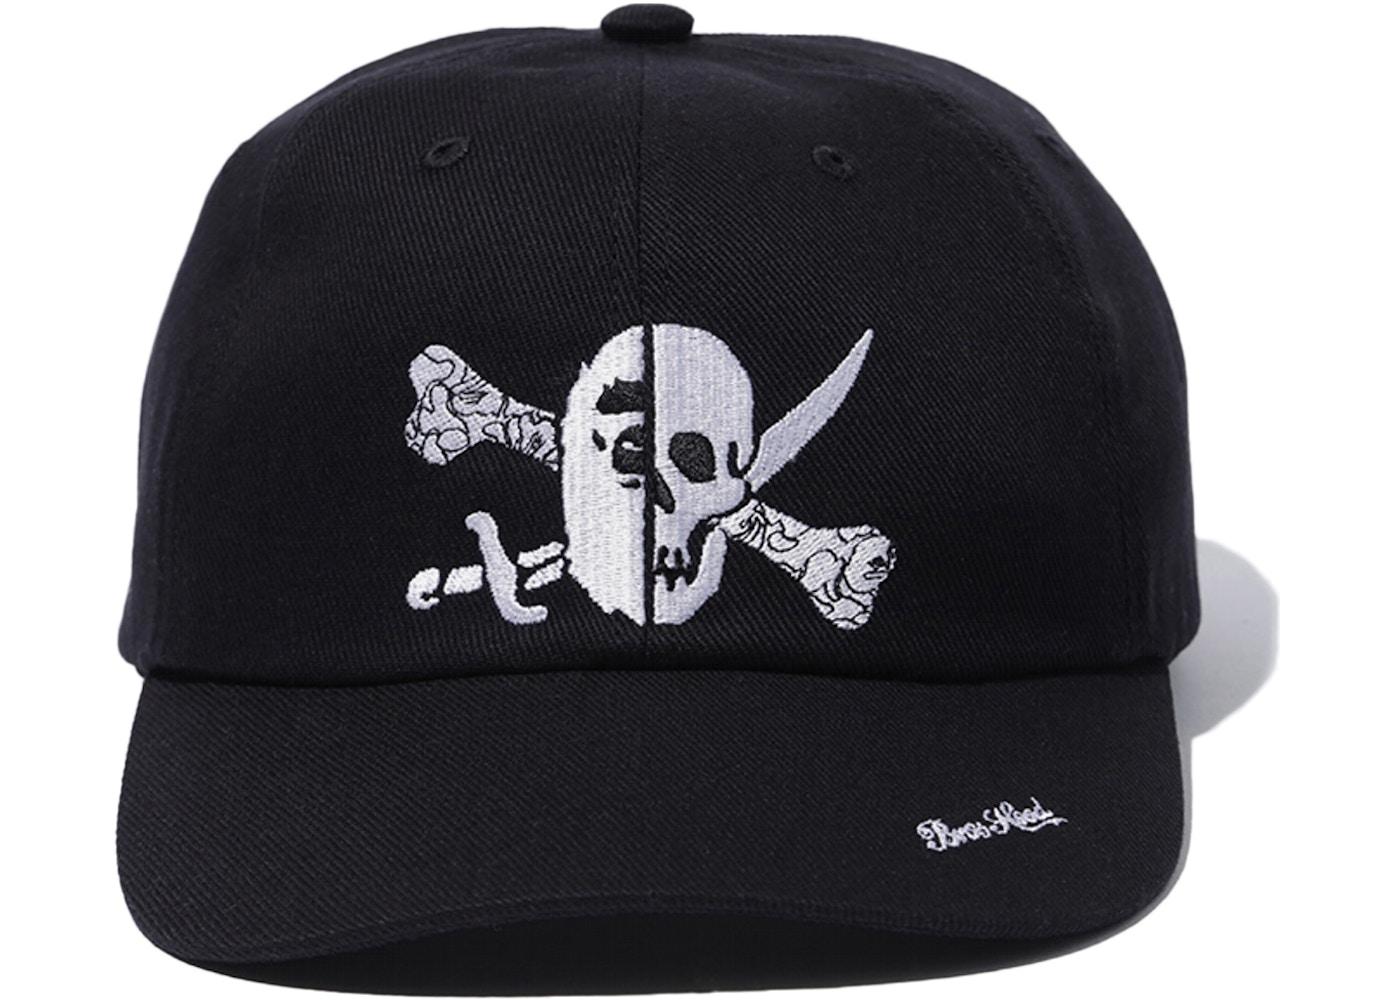 premium selection 3dbd8 39baa BAPE x Neighborhood Ape & Skull Cap Black